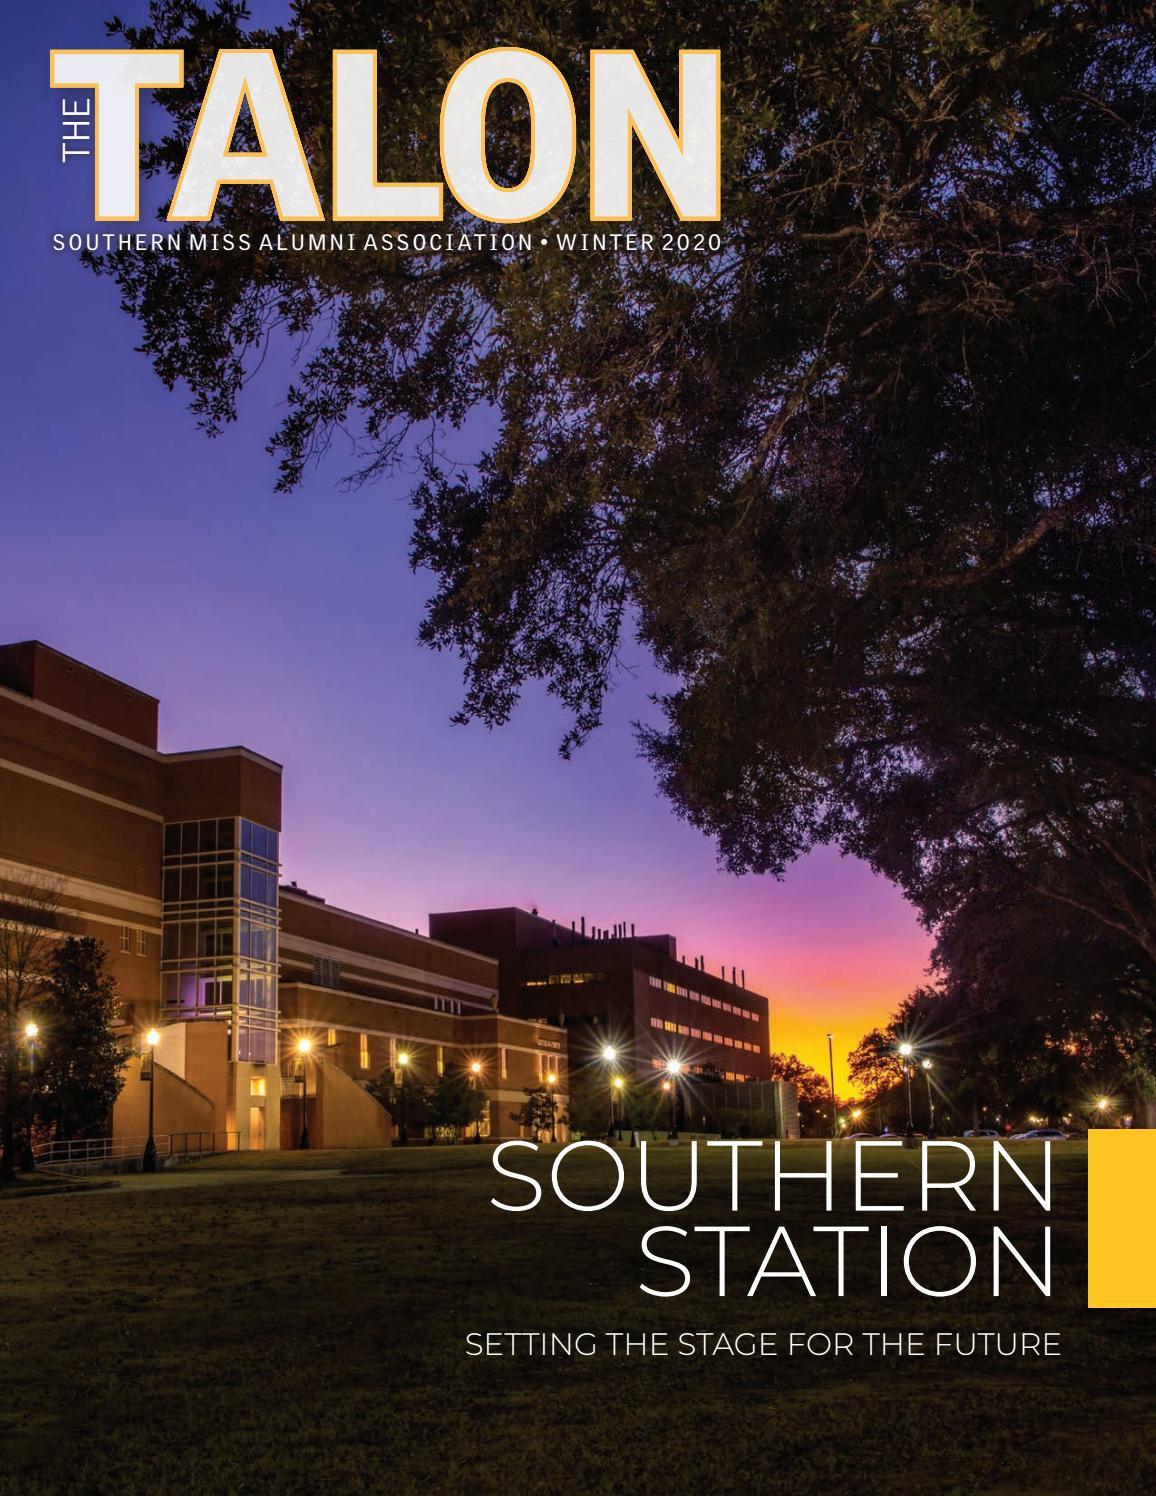 Usm Fall 2022 Calendar.The Talon Winter 2020 By Southern Miss Alumni Association Issuu